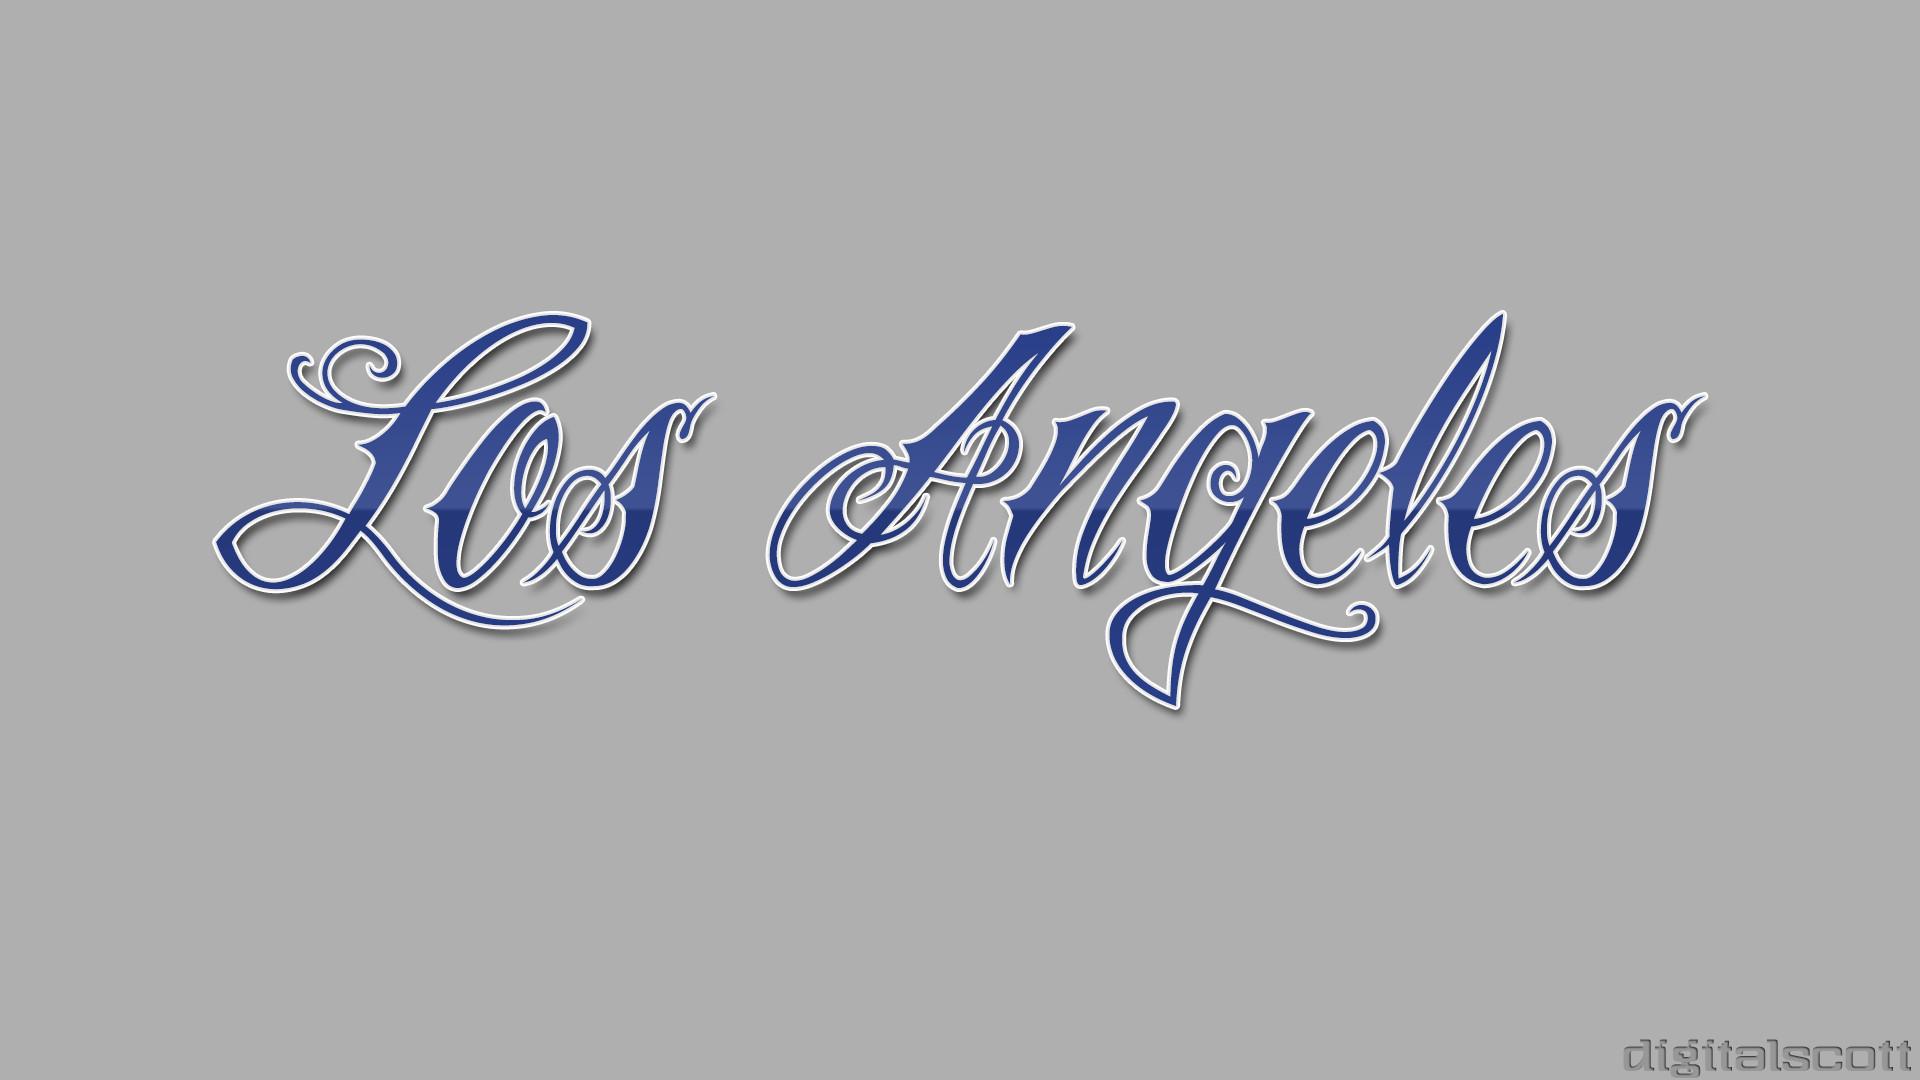 Los Angeles Dodgers Wallpaper – Invitation Templates